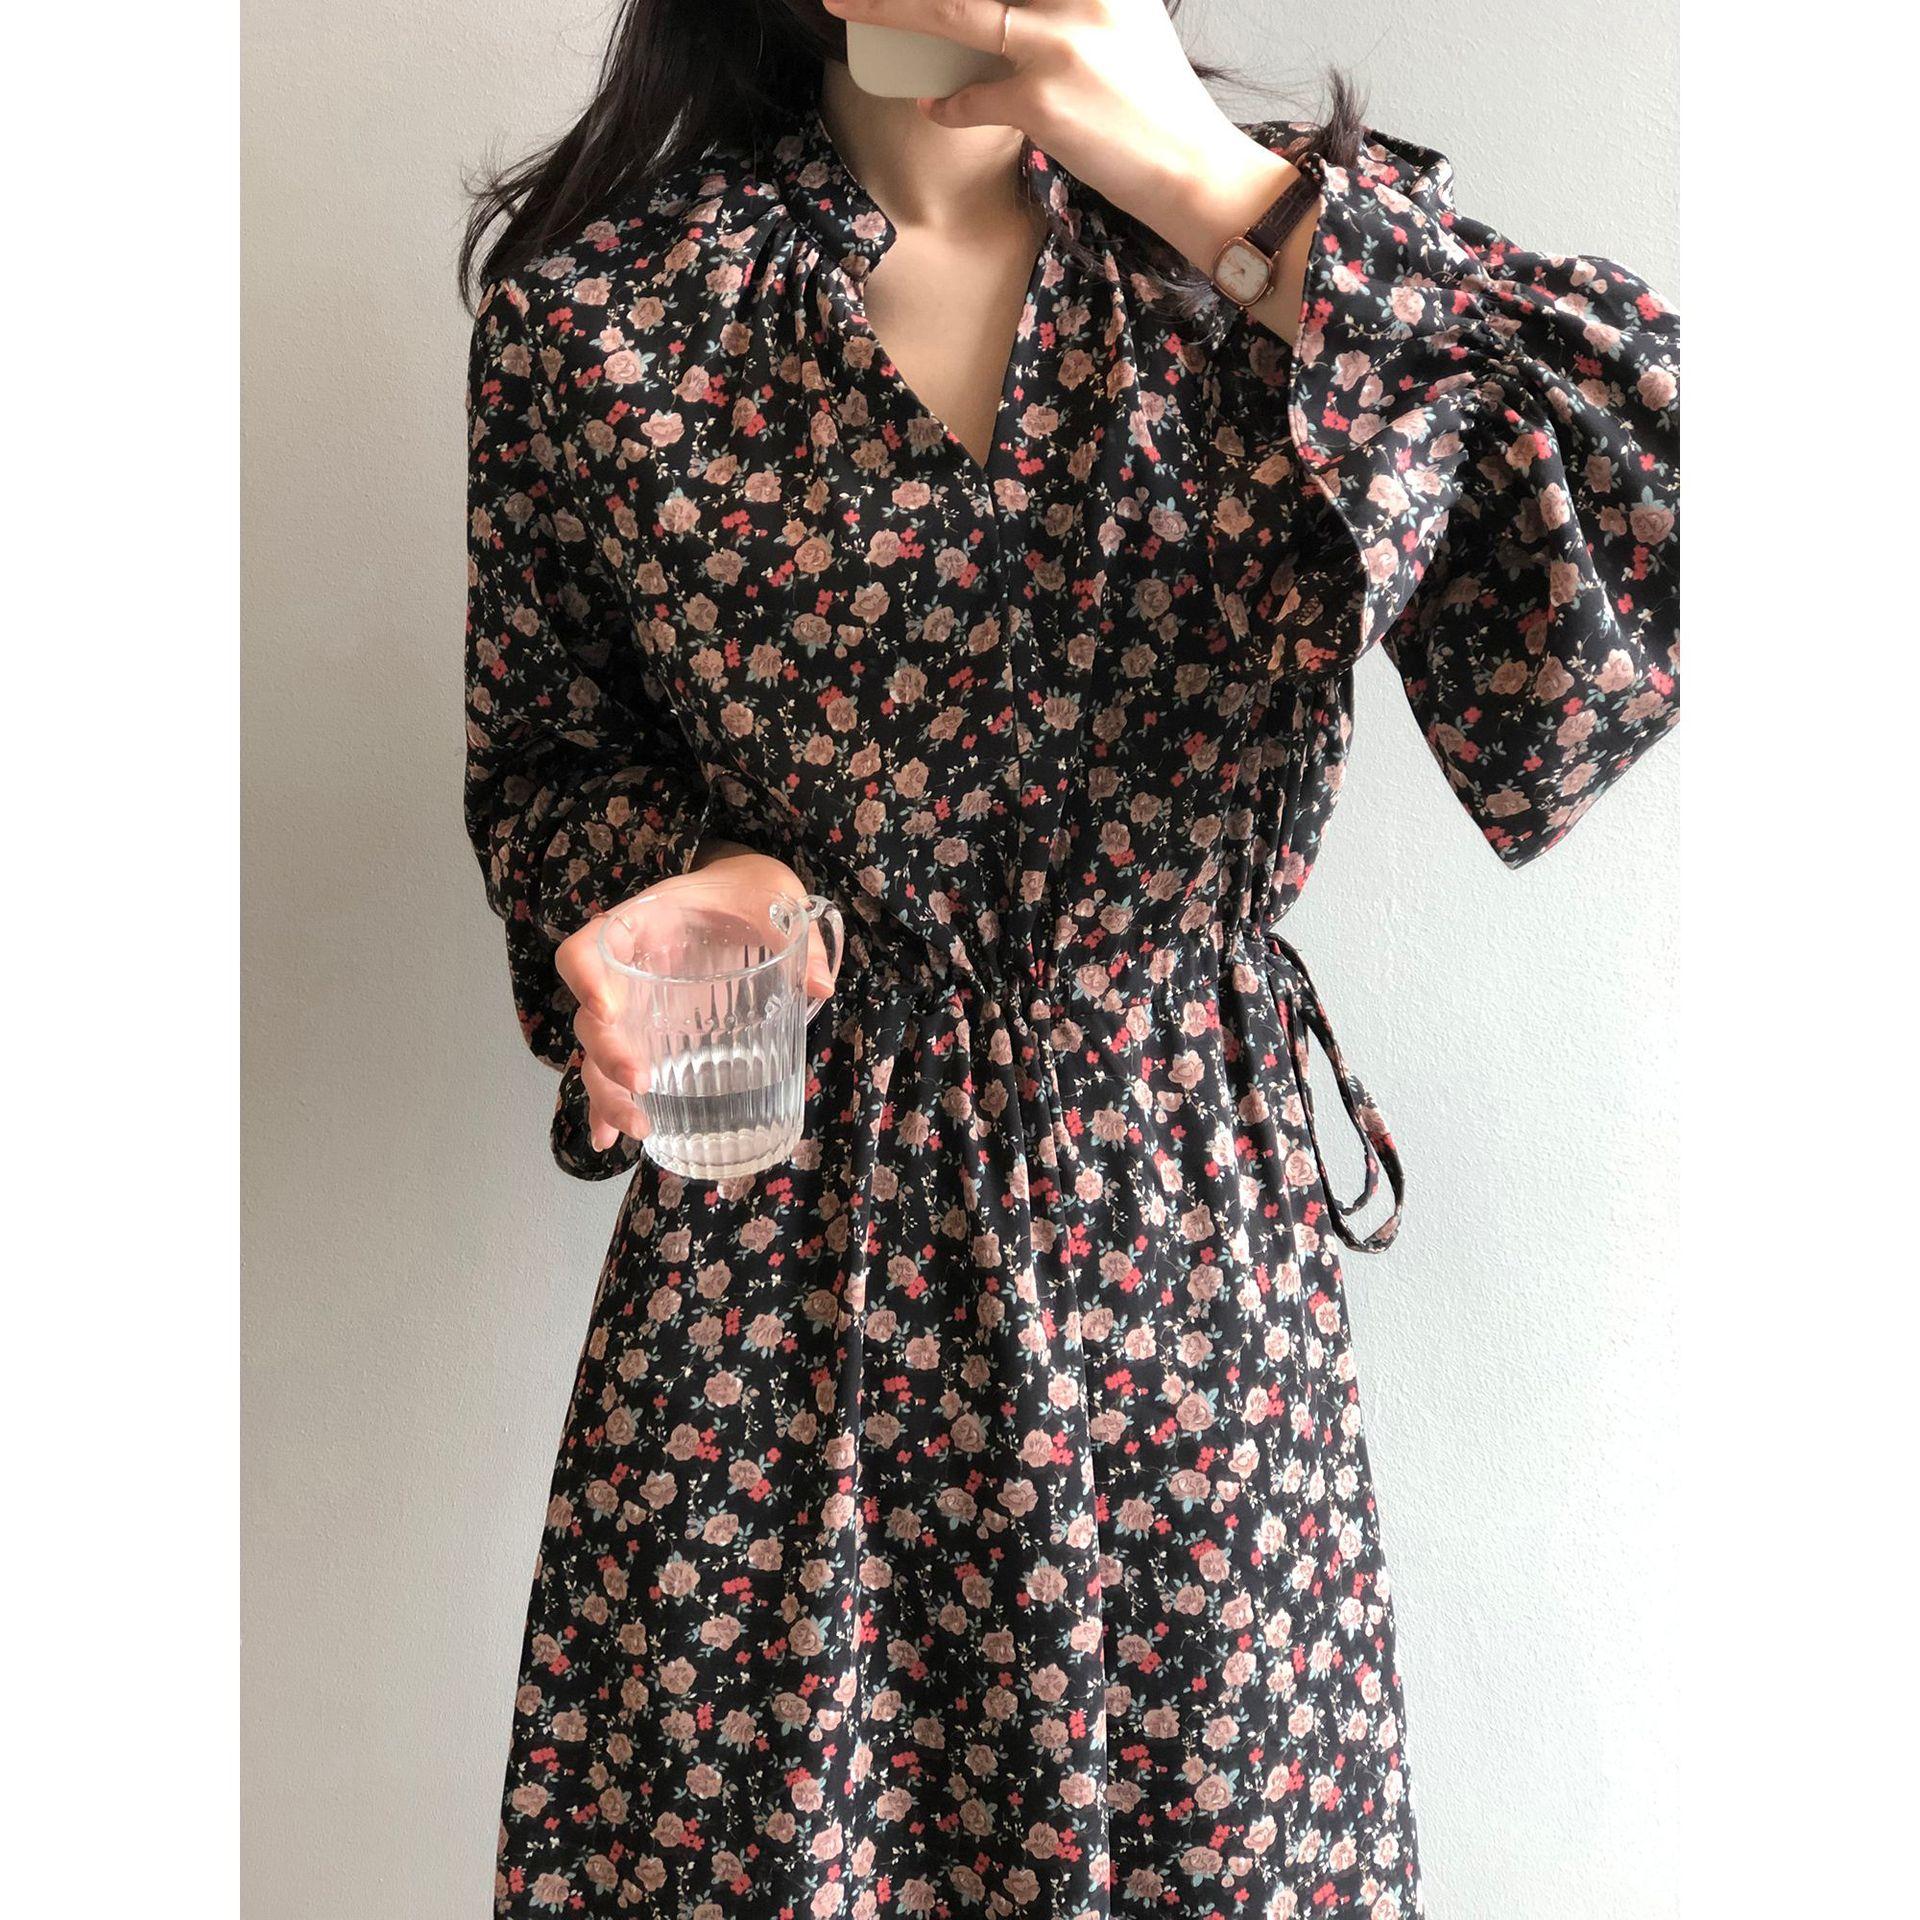 CMAZ Women Midi Dress Vintage Floral Print Chiffon Boho Long Dress Turn Down Collar Casual Elegant Shirt Dresses Vestidos 80090#